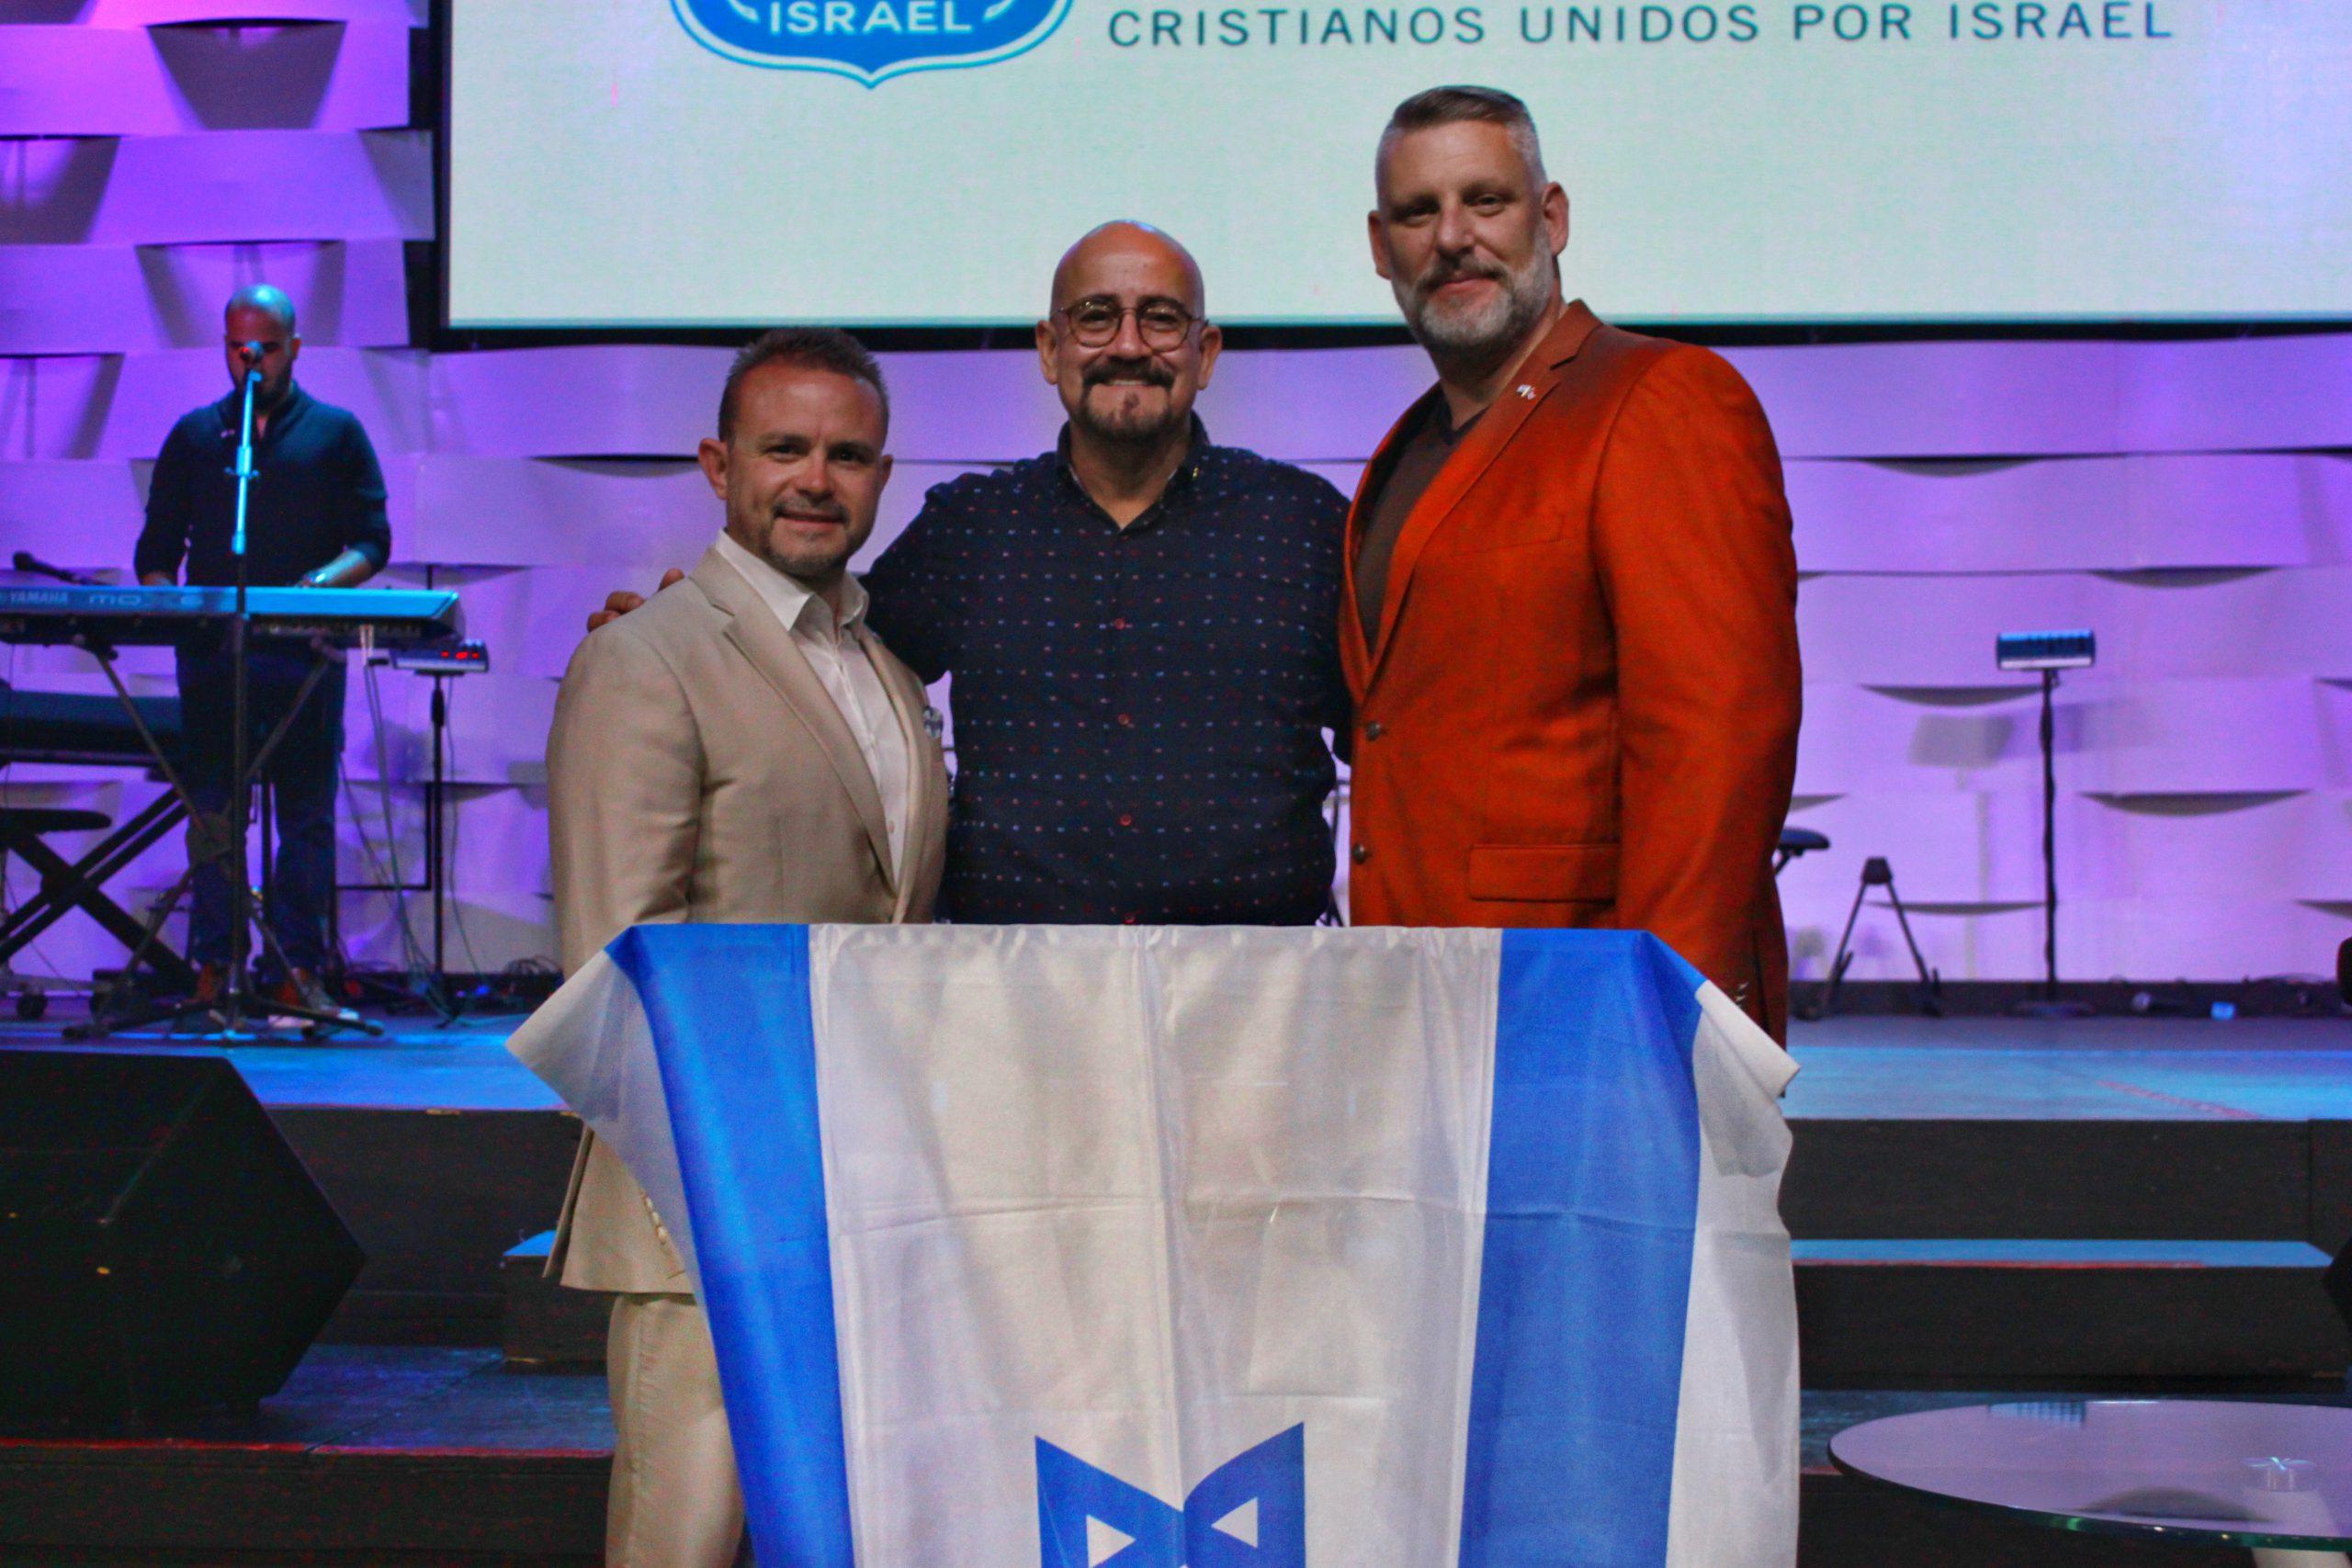 Mar. 15th Añasco, Puerto Rico Spanish Pastors Meeting Dinner